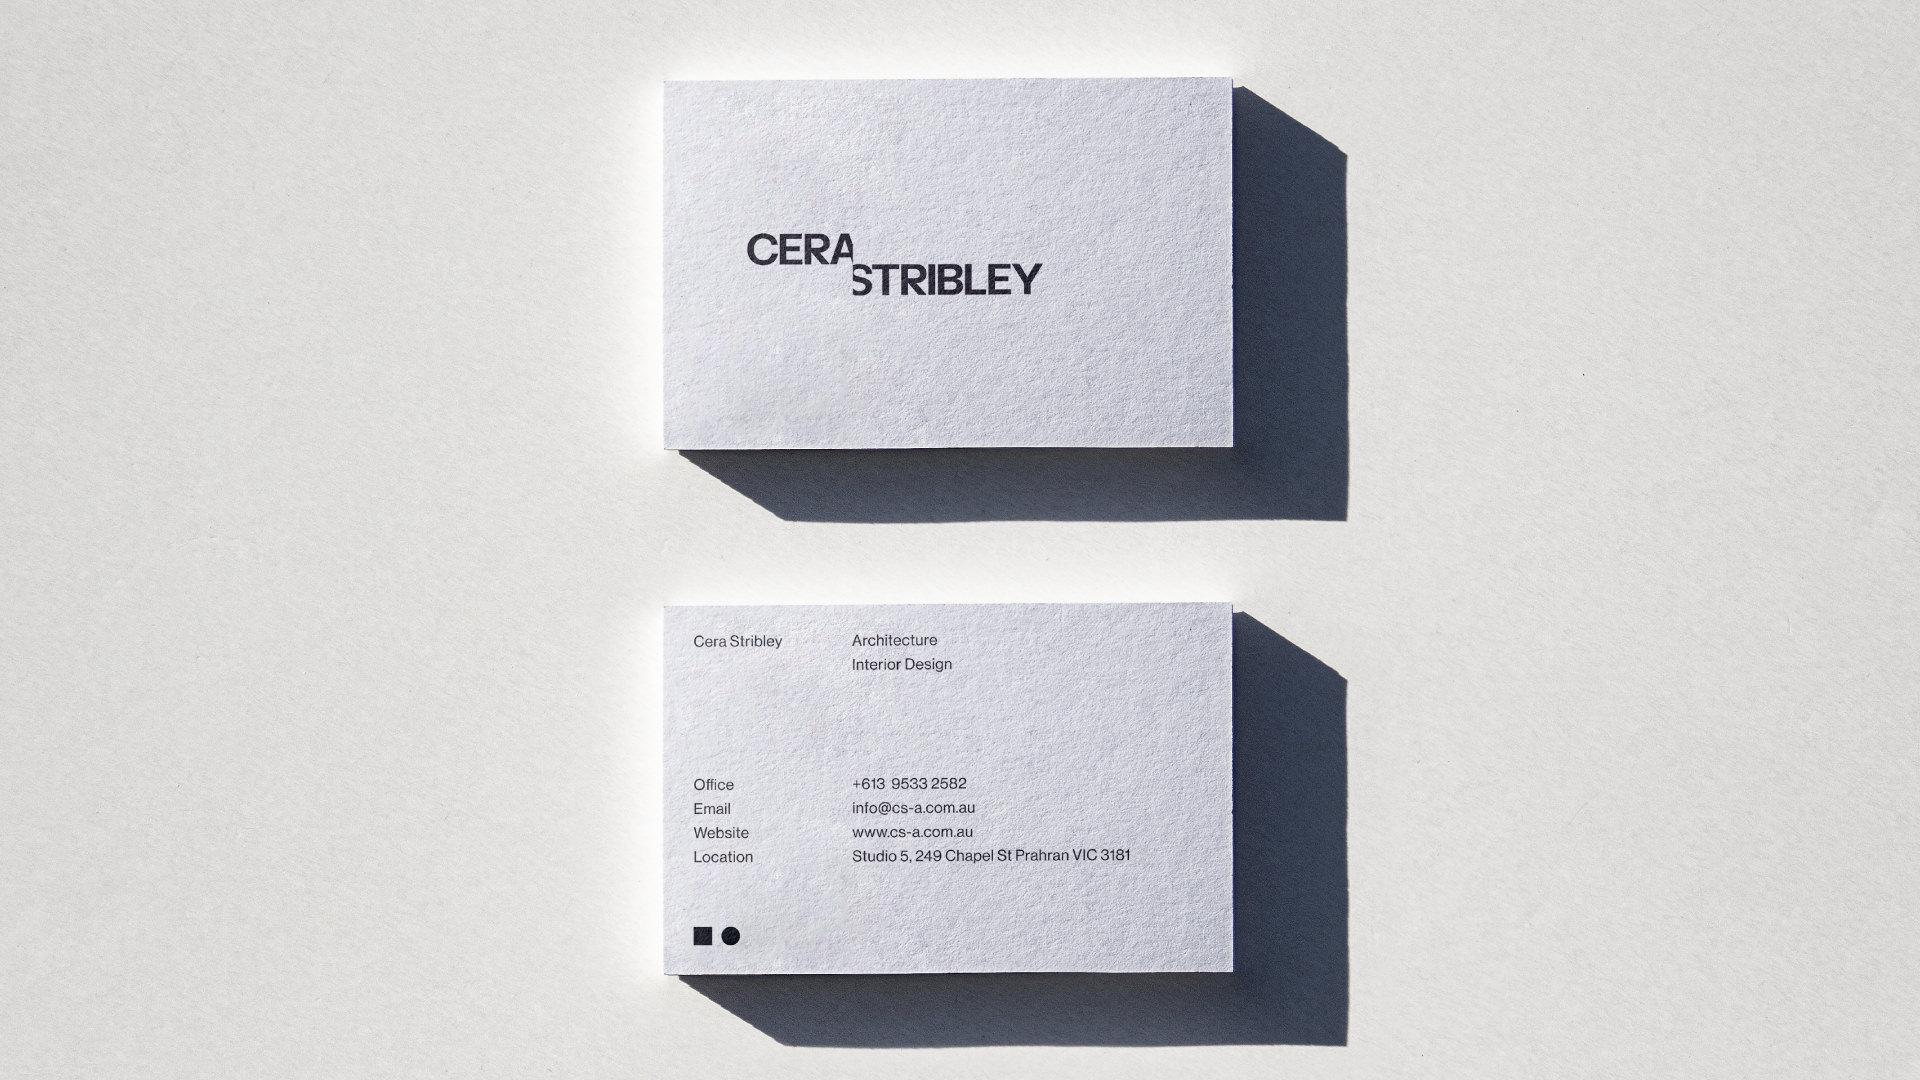 Hortenzia_CeraStribley_BusinessCard_1